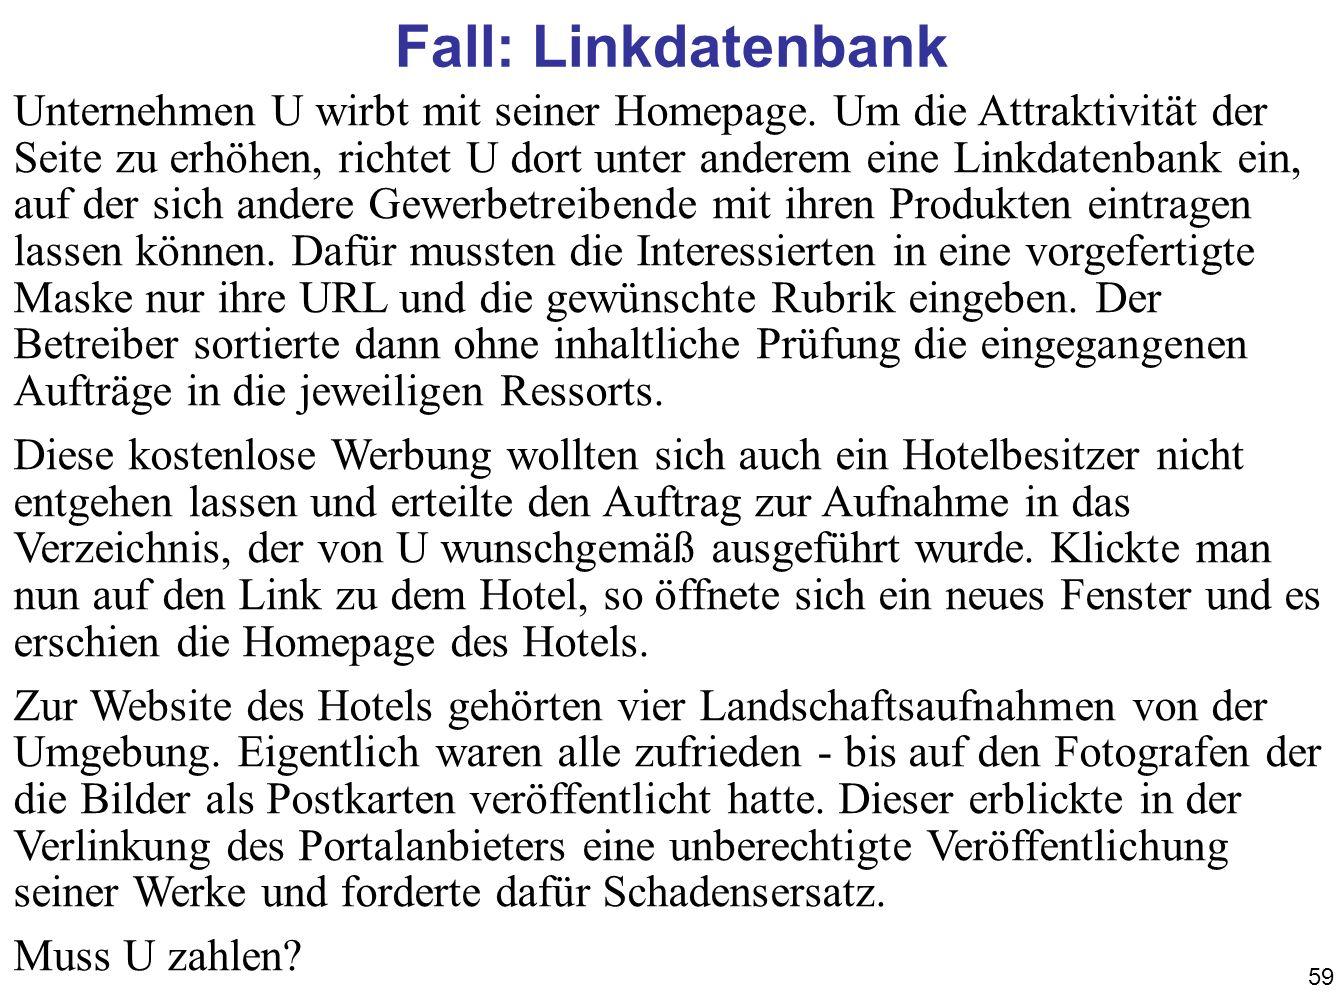 Fall: Linkdatenbank